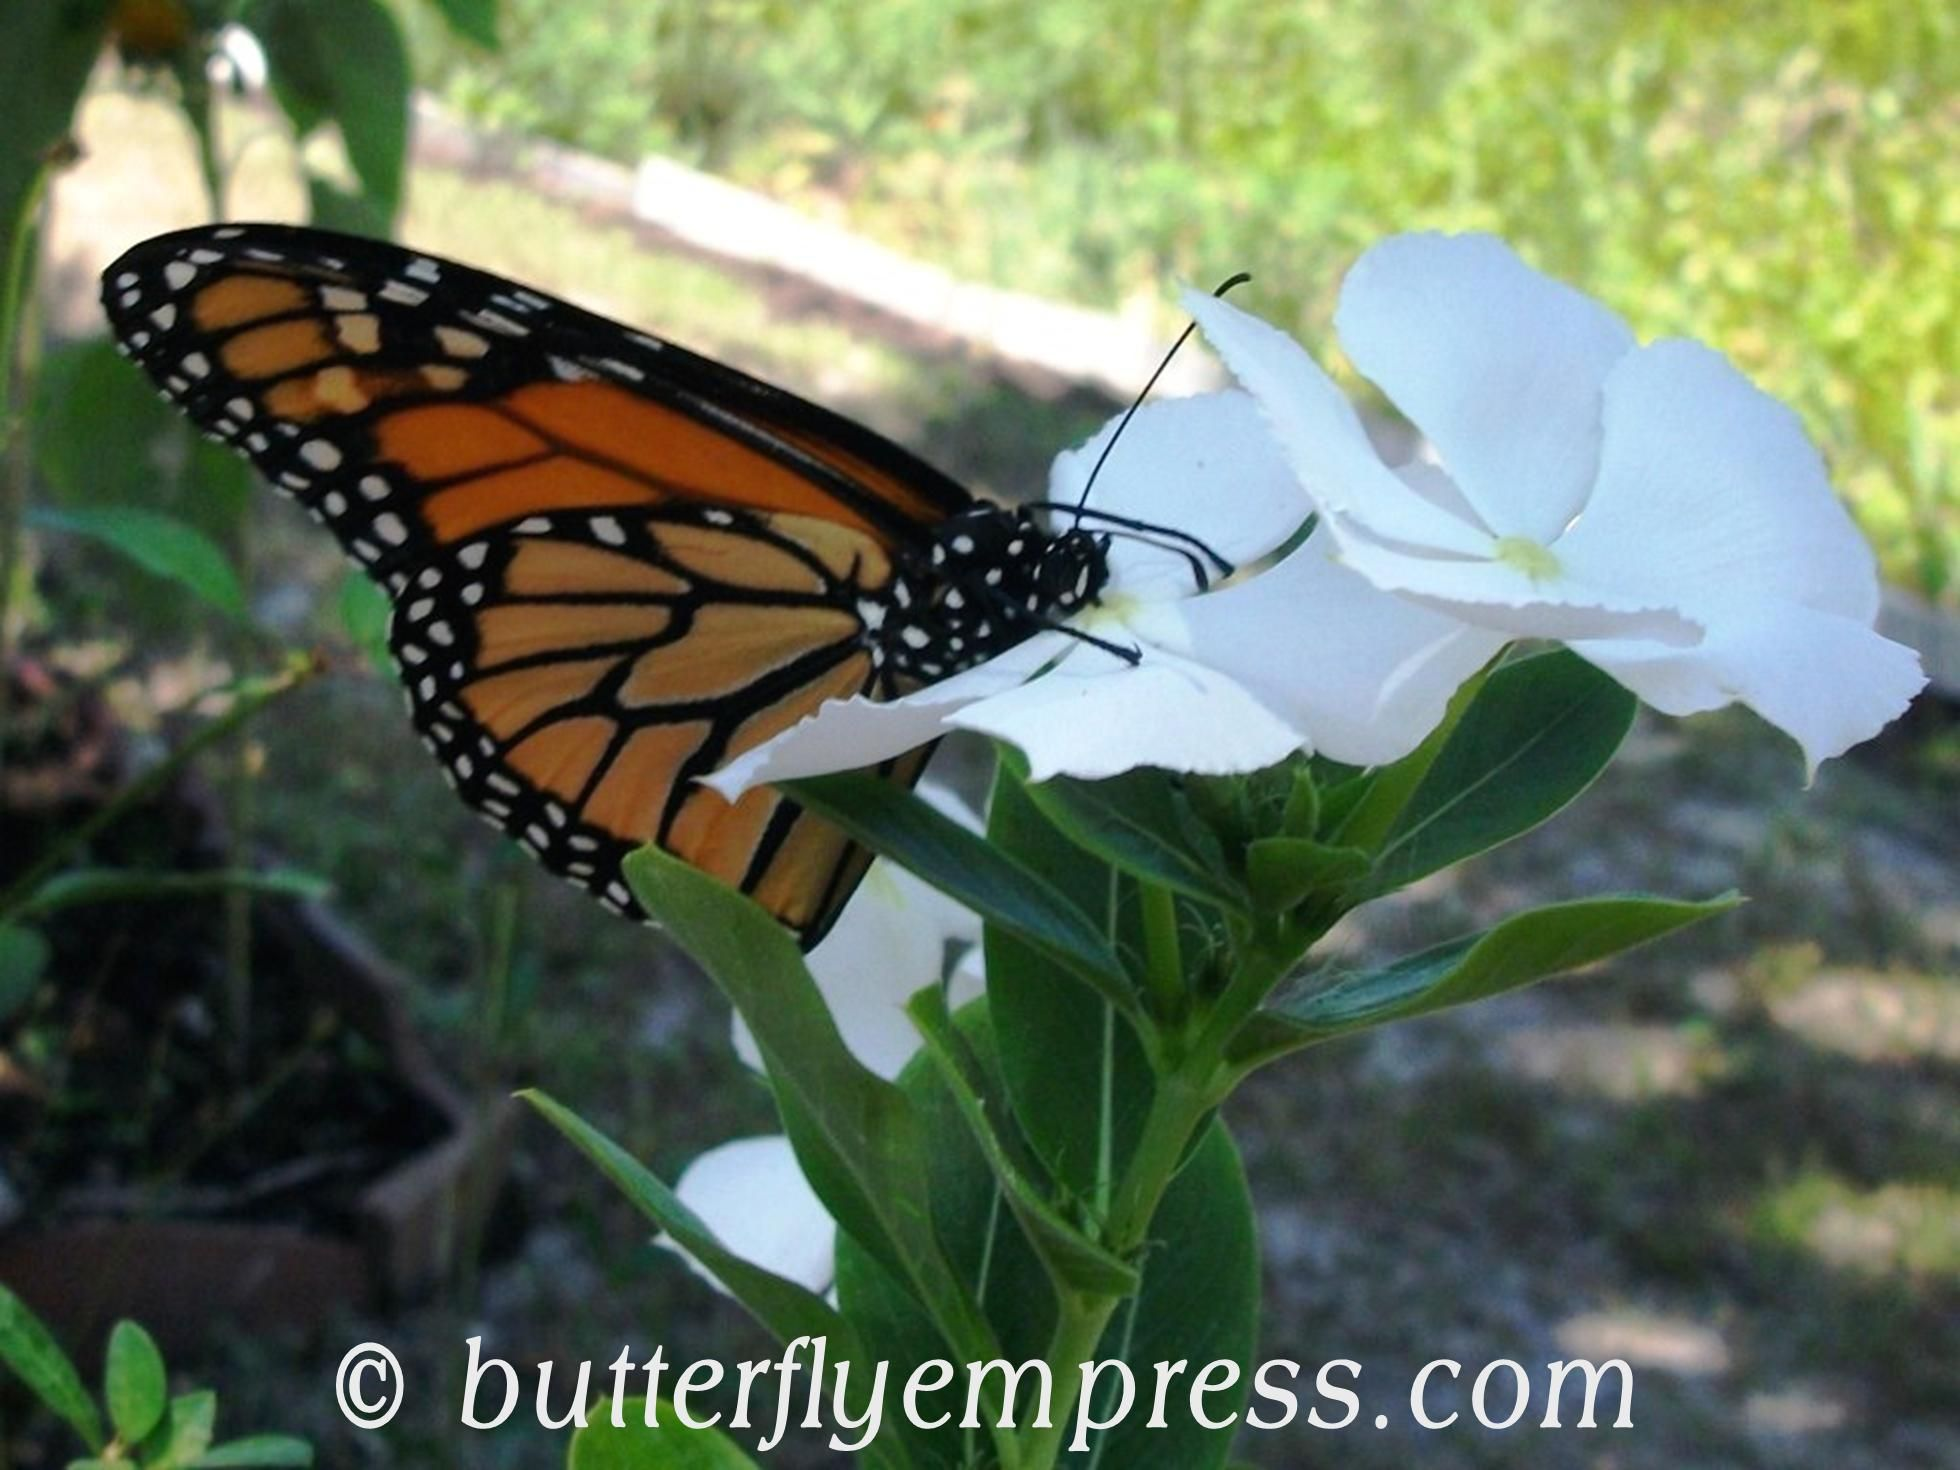 Monarch feeding on Madagascar Periwinkle Butterfly